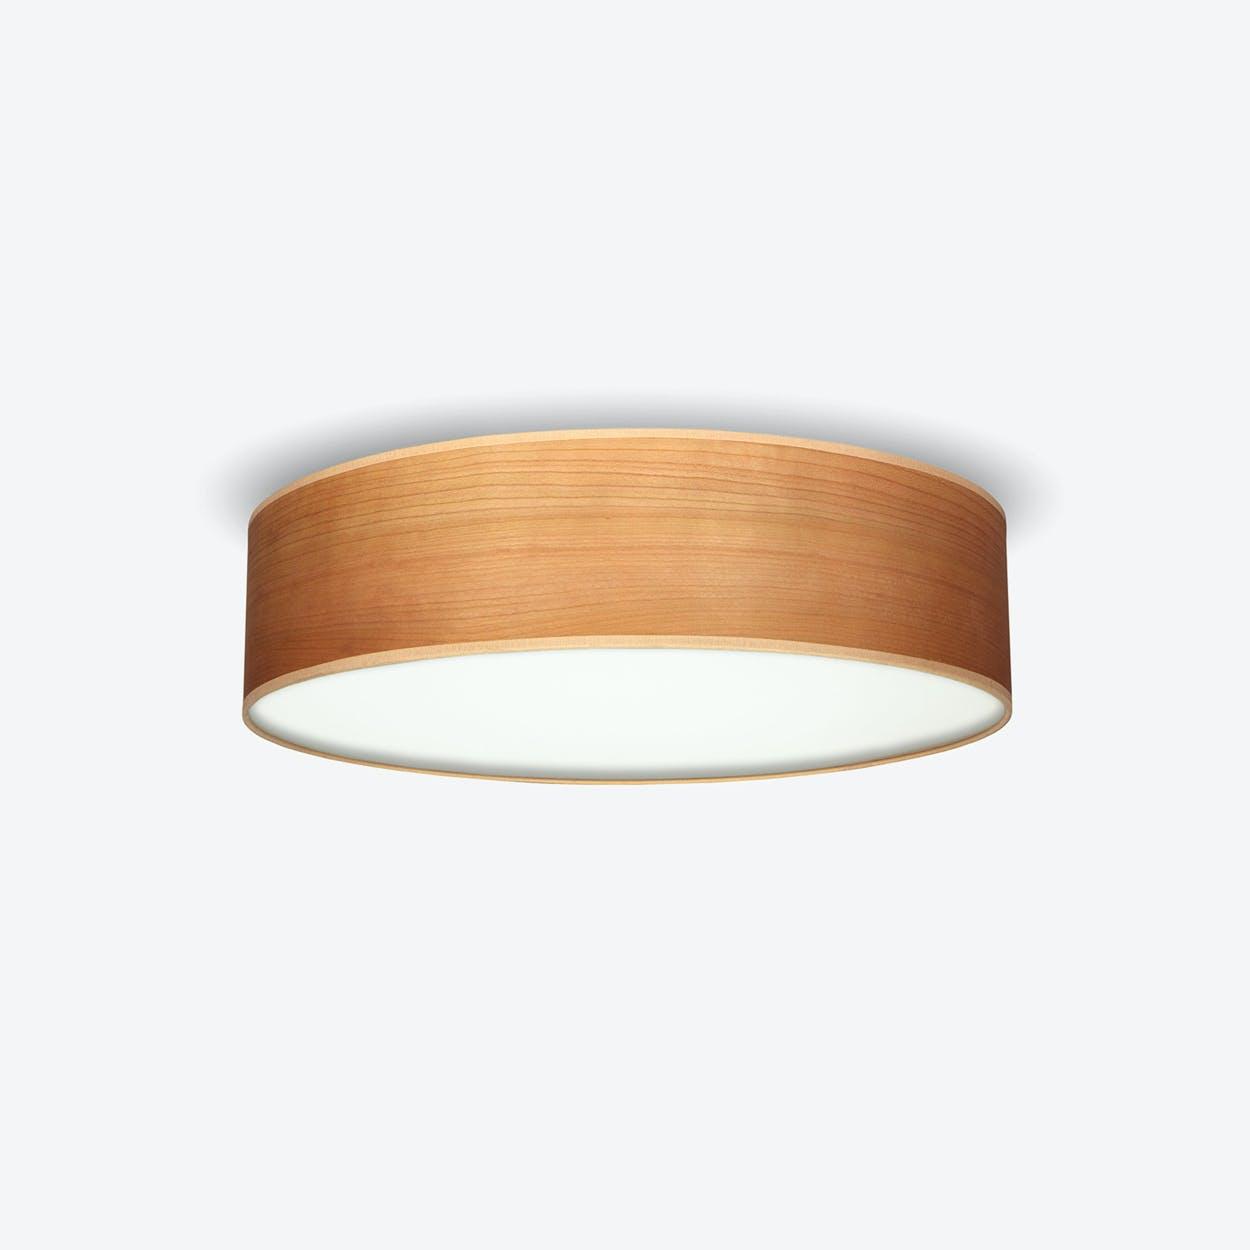 TSURI Large Ceiling Lamp in Cherry